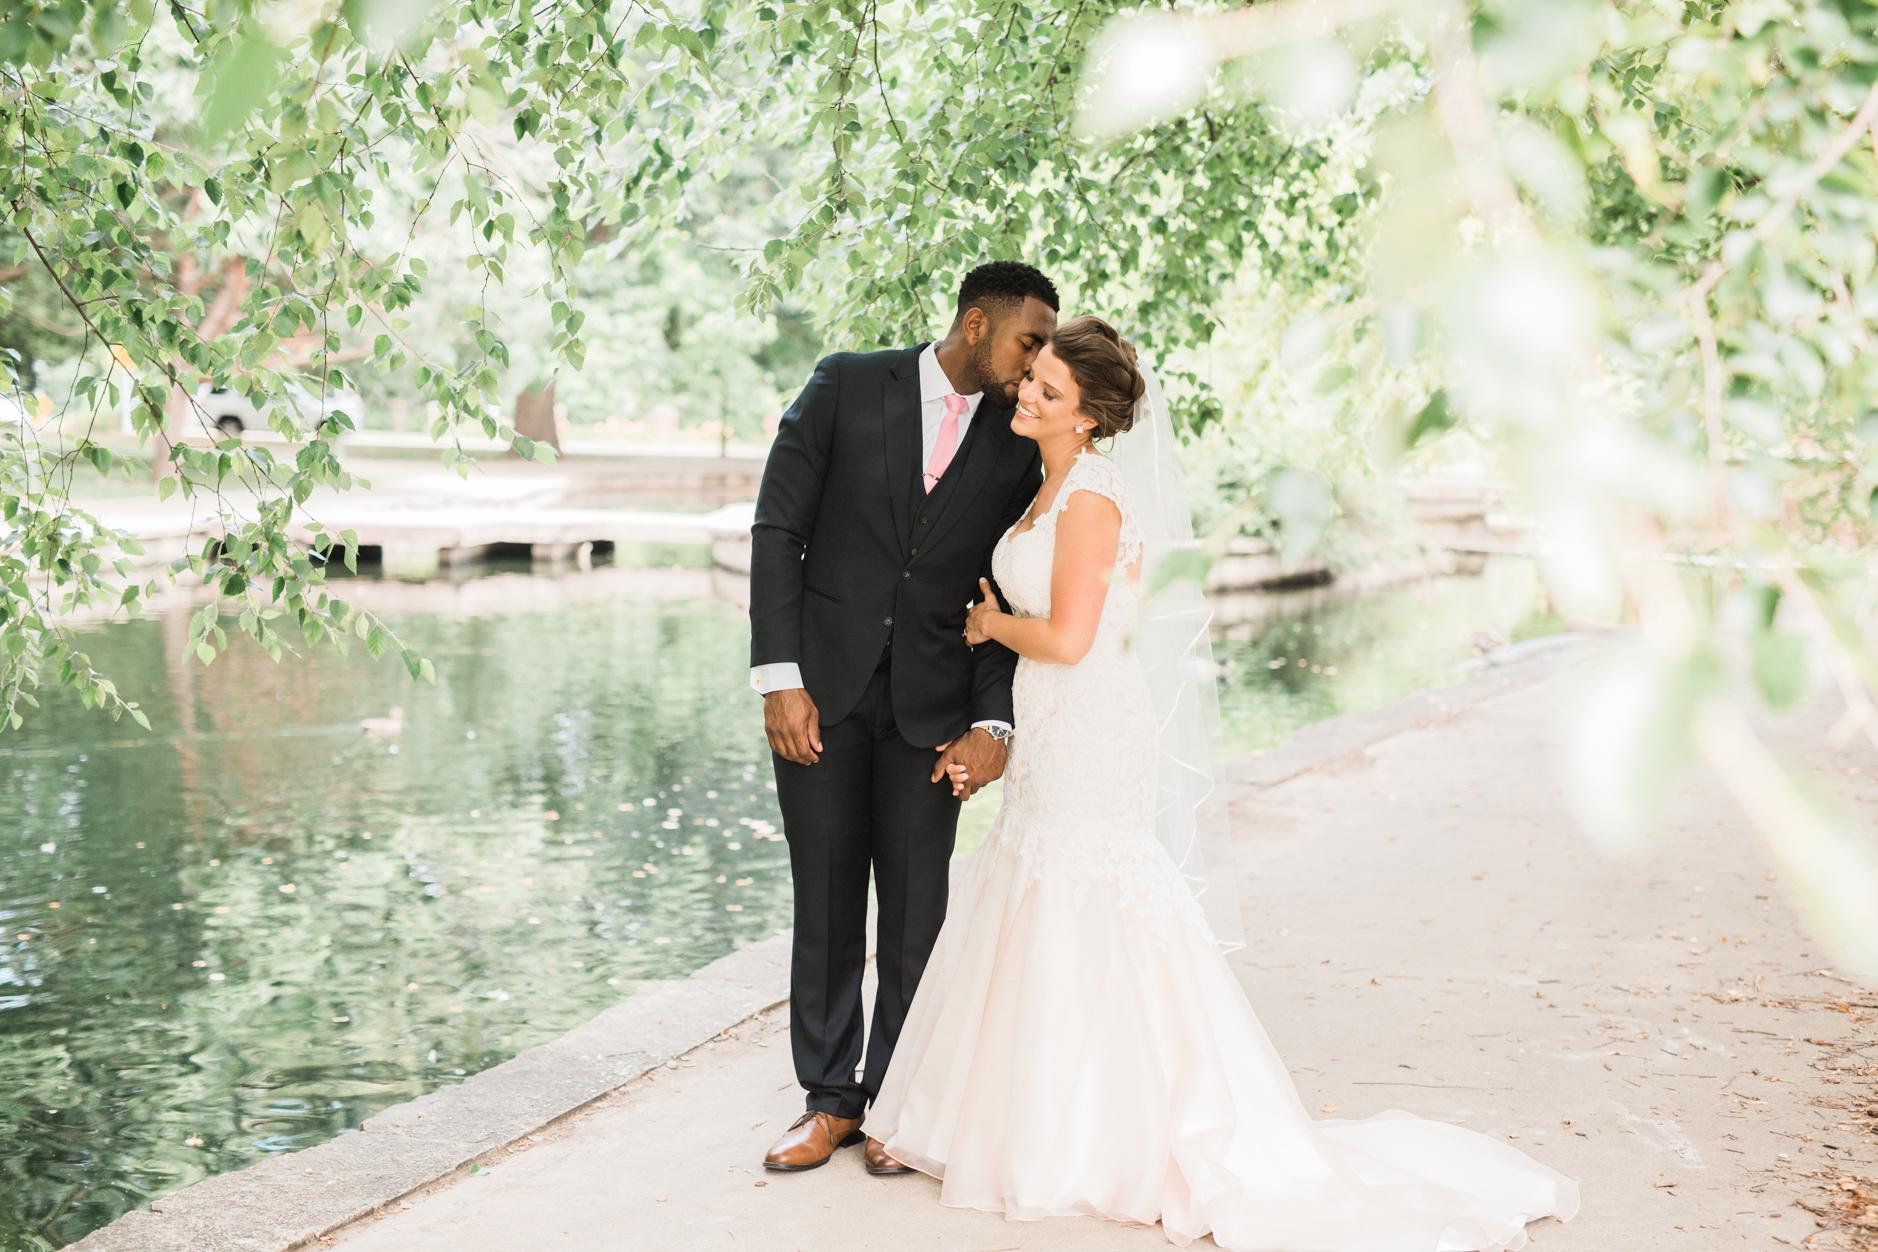 LegacyUnion-Wedding-Photographer-Glendale-CA-37.jpg